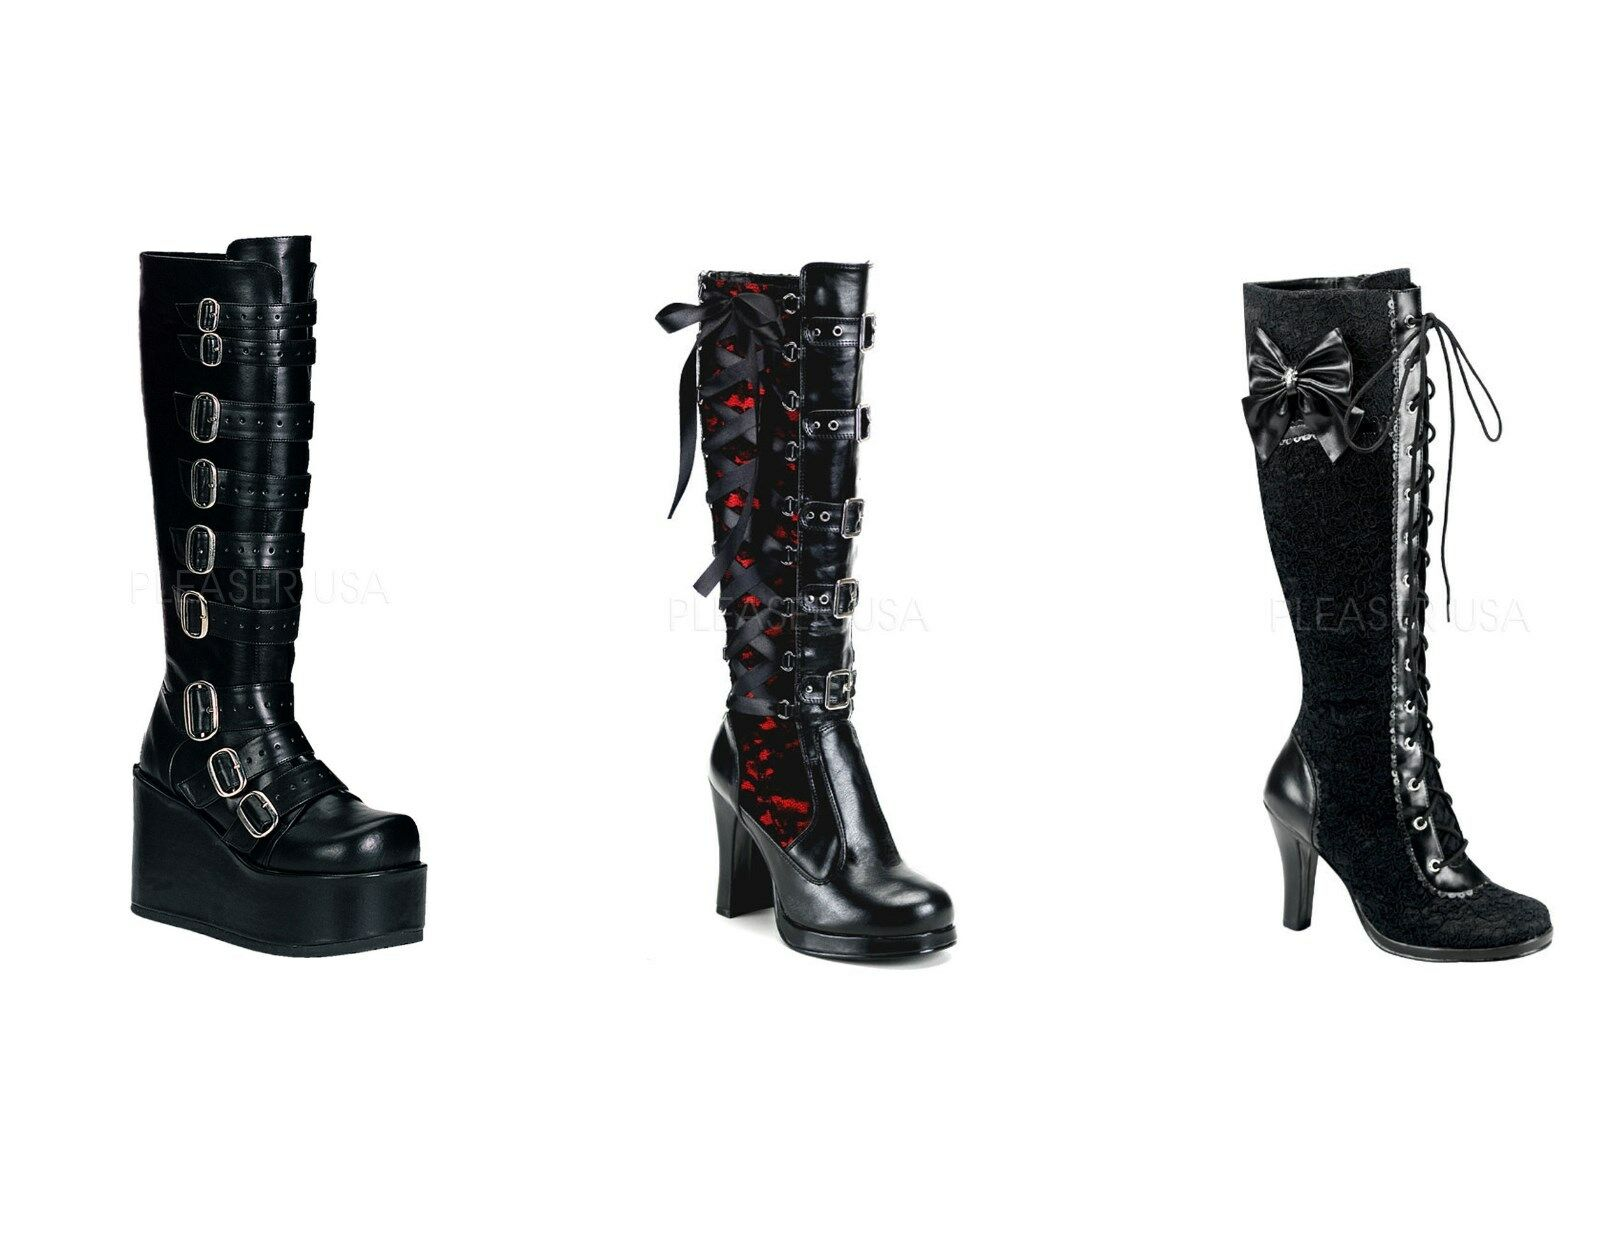 Demonia CONCORD-108 CRYPTO-106 GLAM-240 Women's Goth Punk Vegan Boots